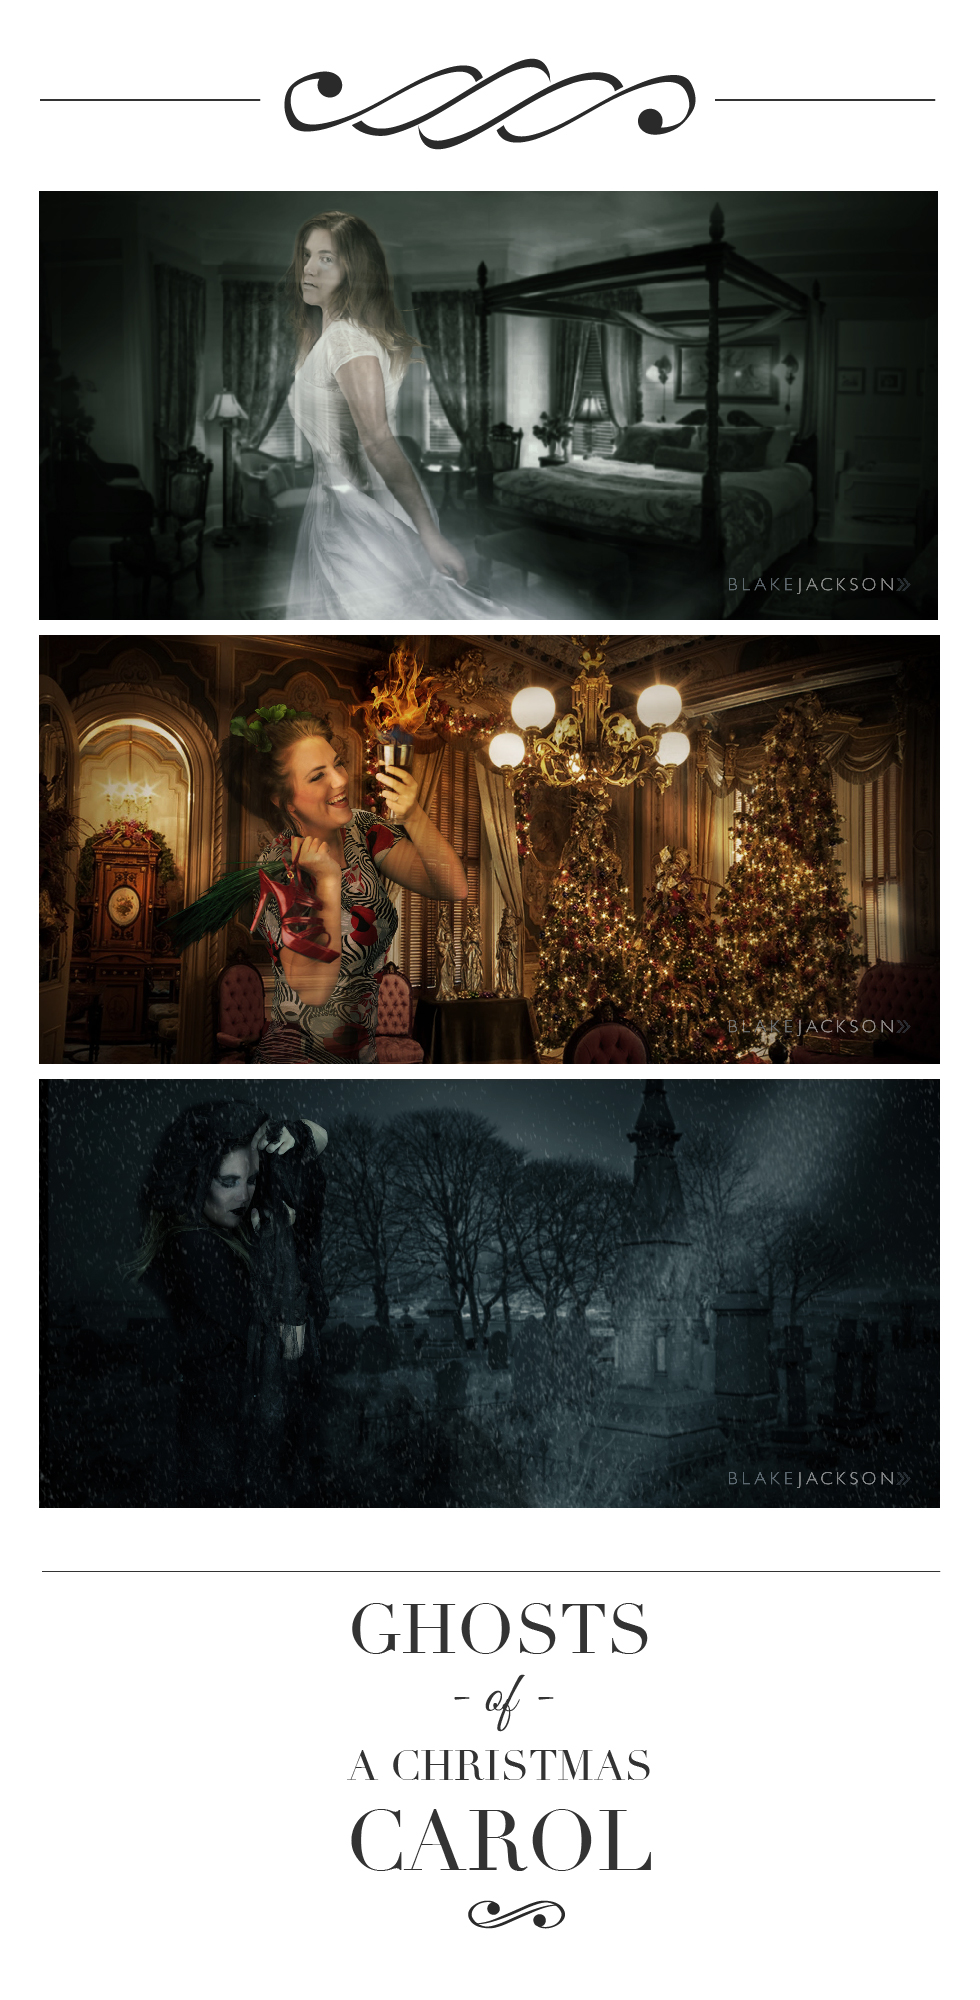 Blake Jackson Creative | Ghosts of a Christmas Carol